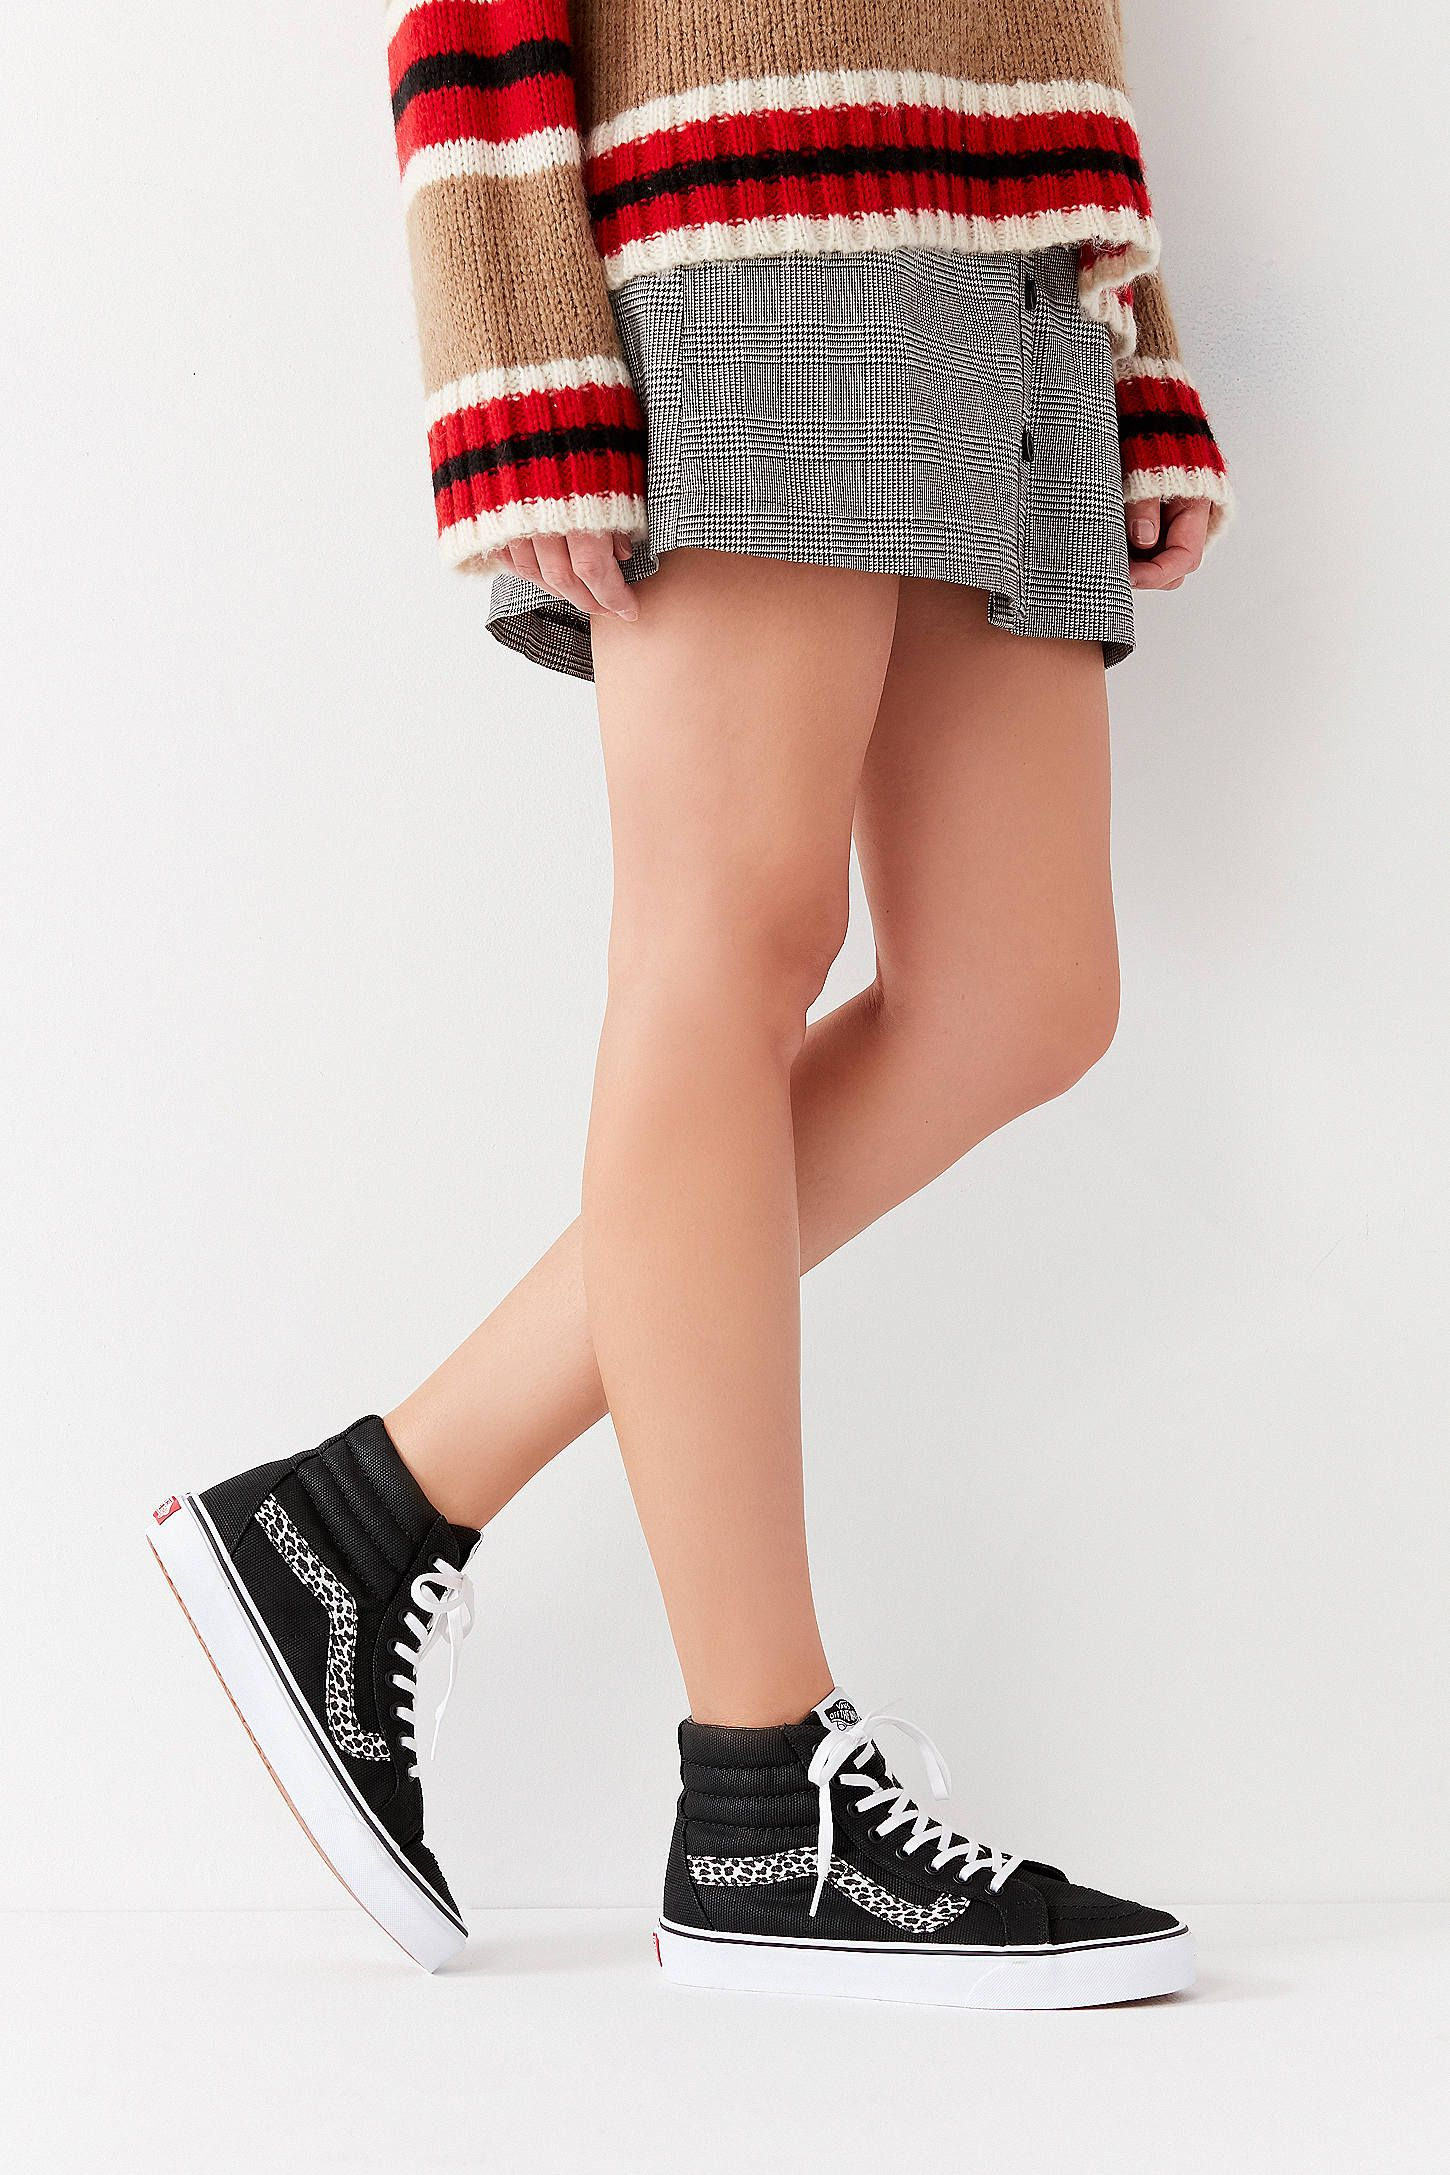 bec18b4c4861 Vans Mini Leopard Sk8-Hi Reissue Sneaker   style & self   Sk8 hi ...